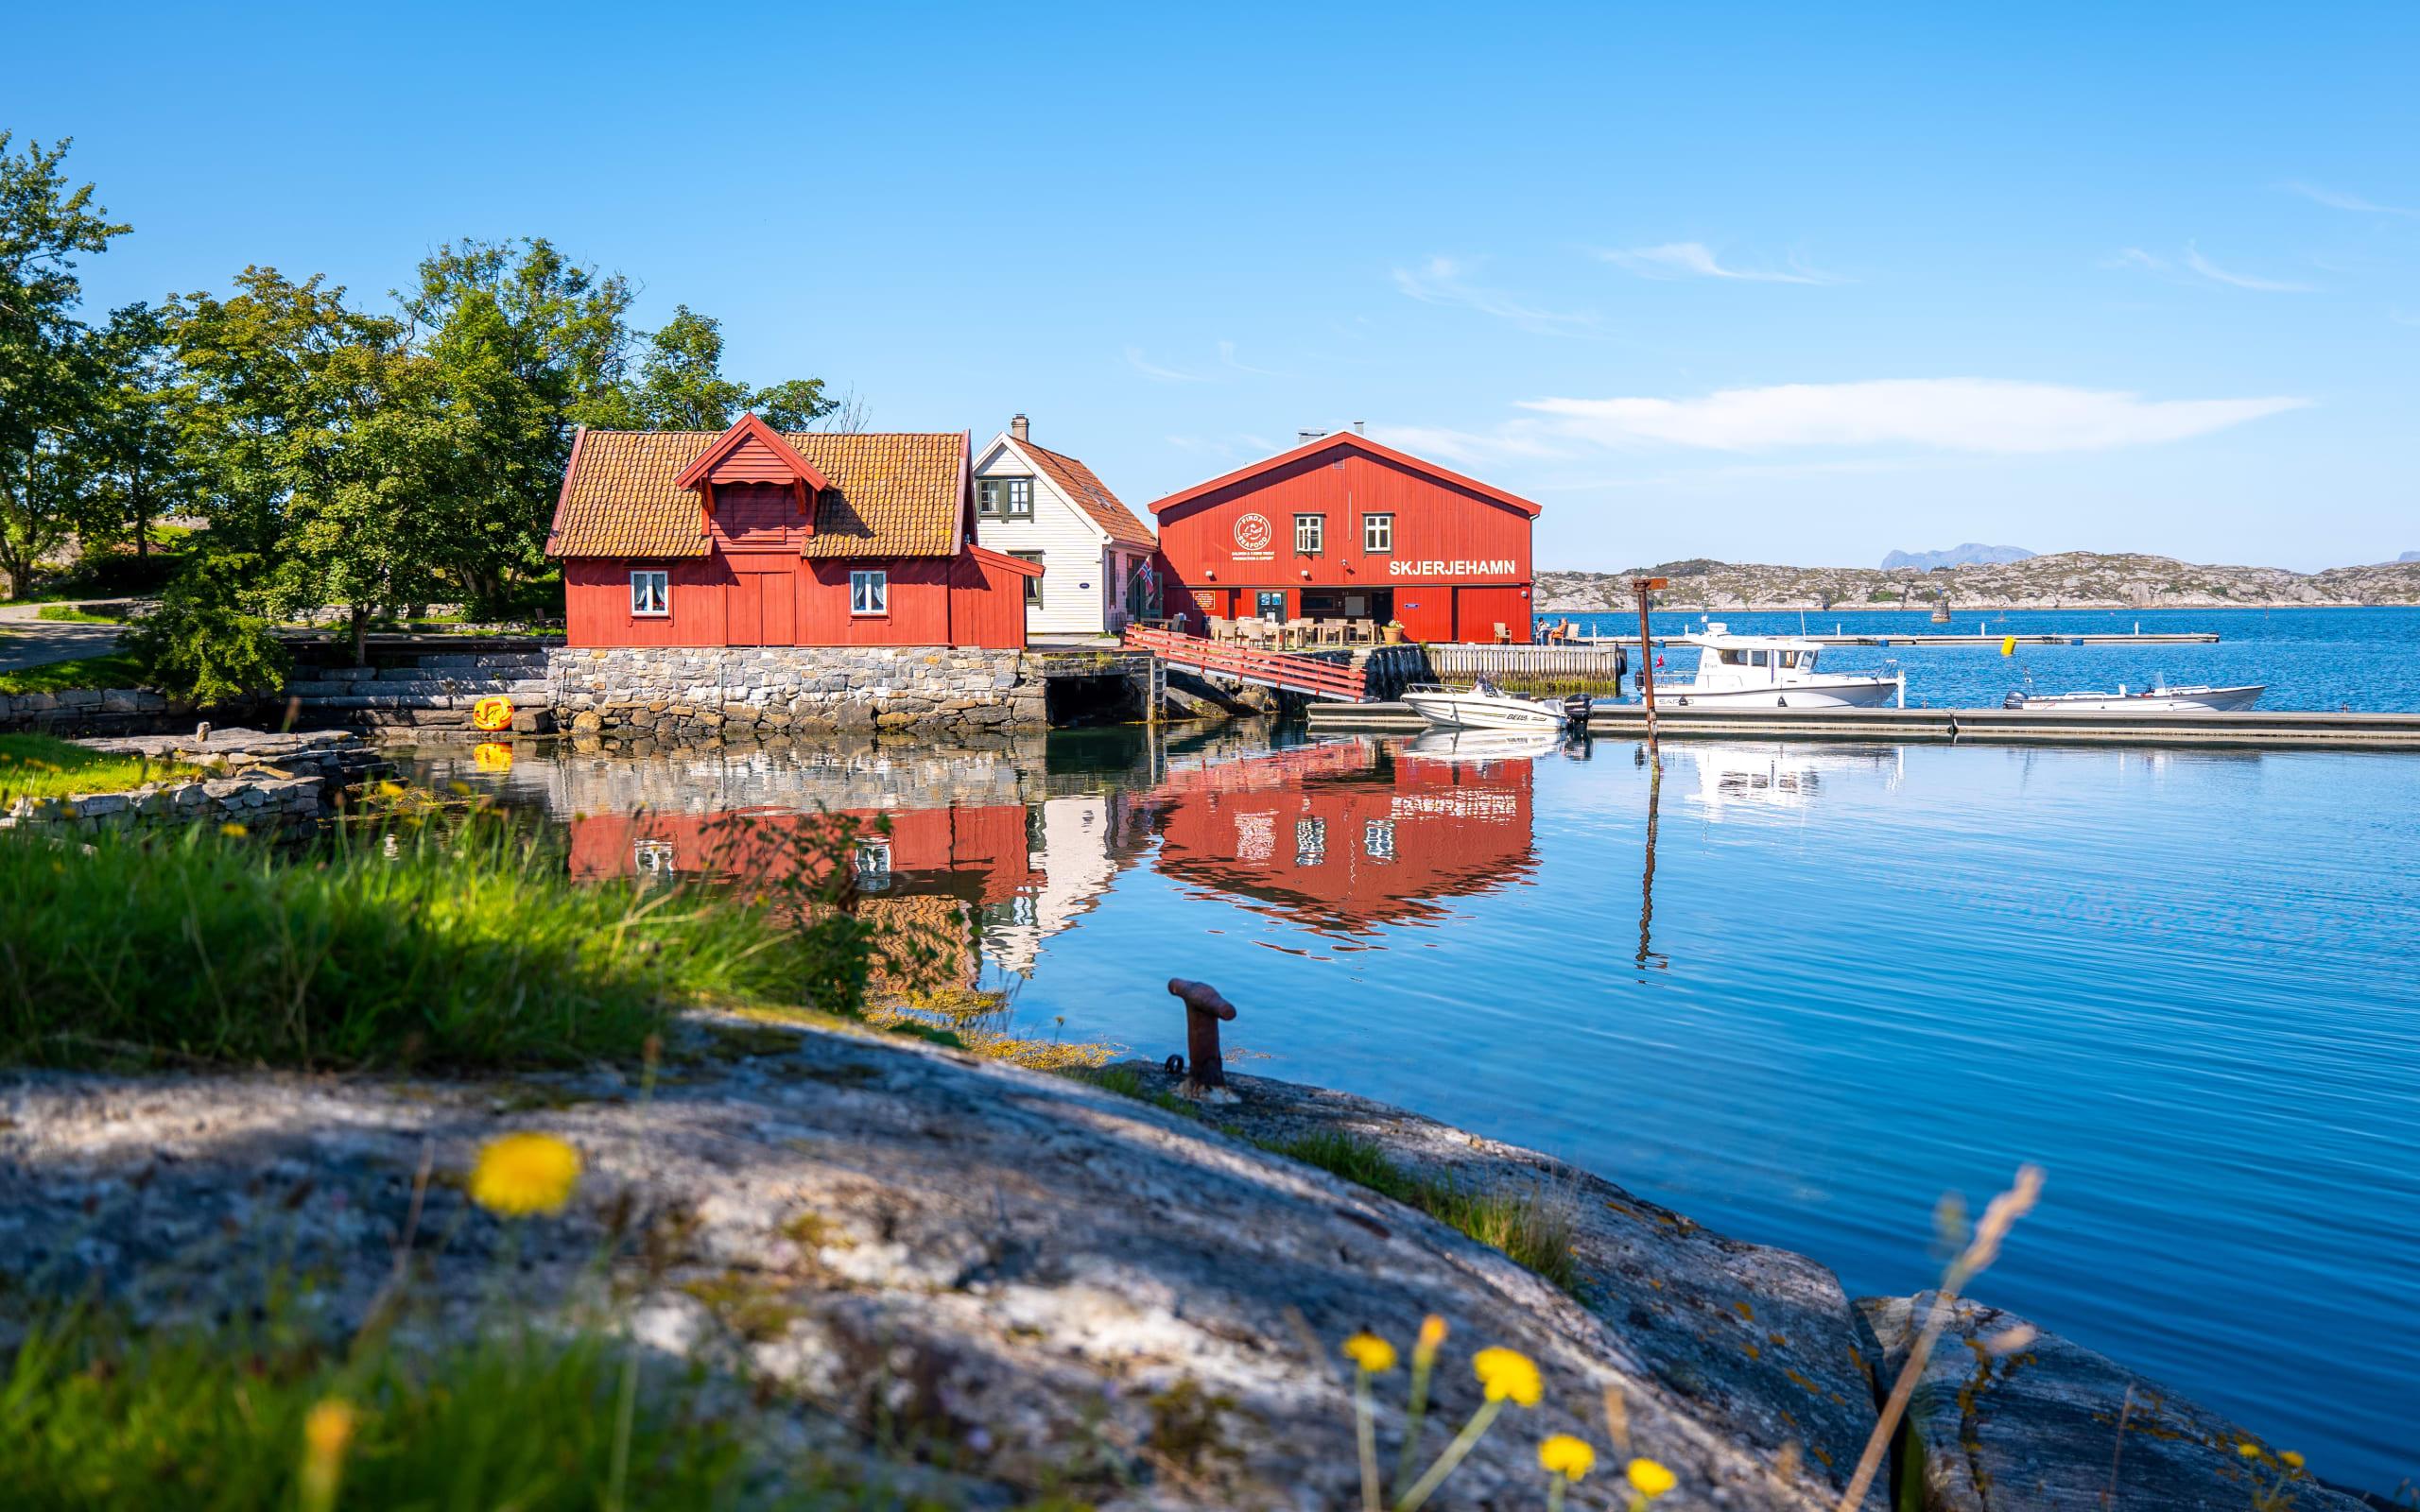 Skjerjehamn harbor island gem